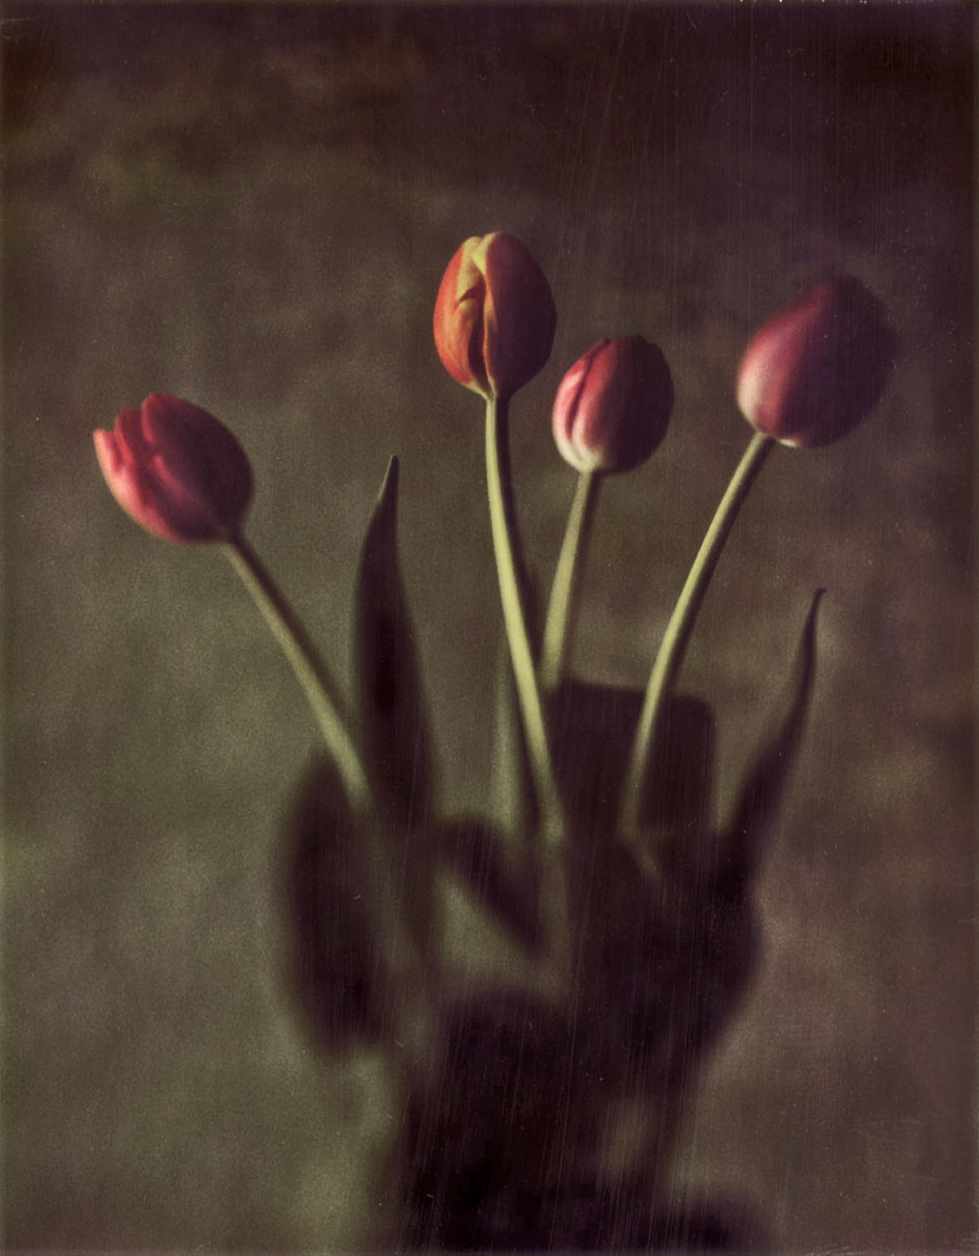 Tulips4.jpg